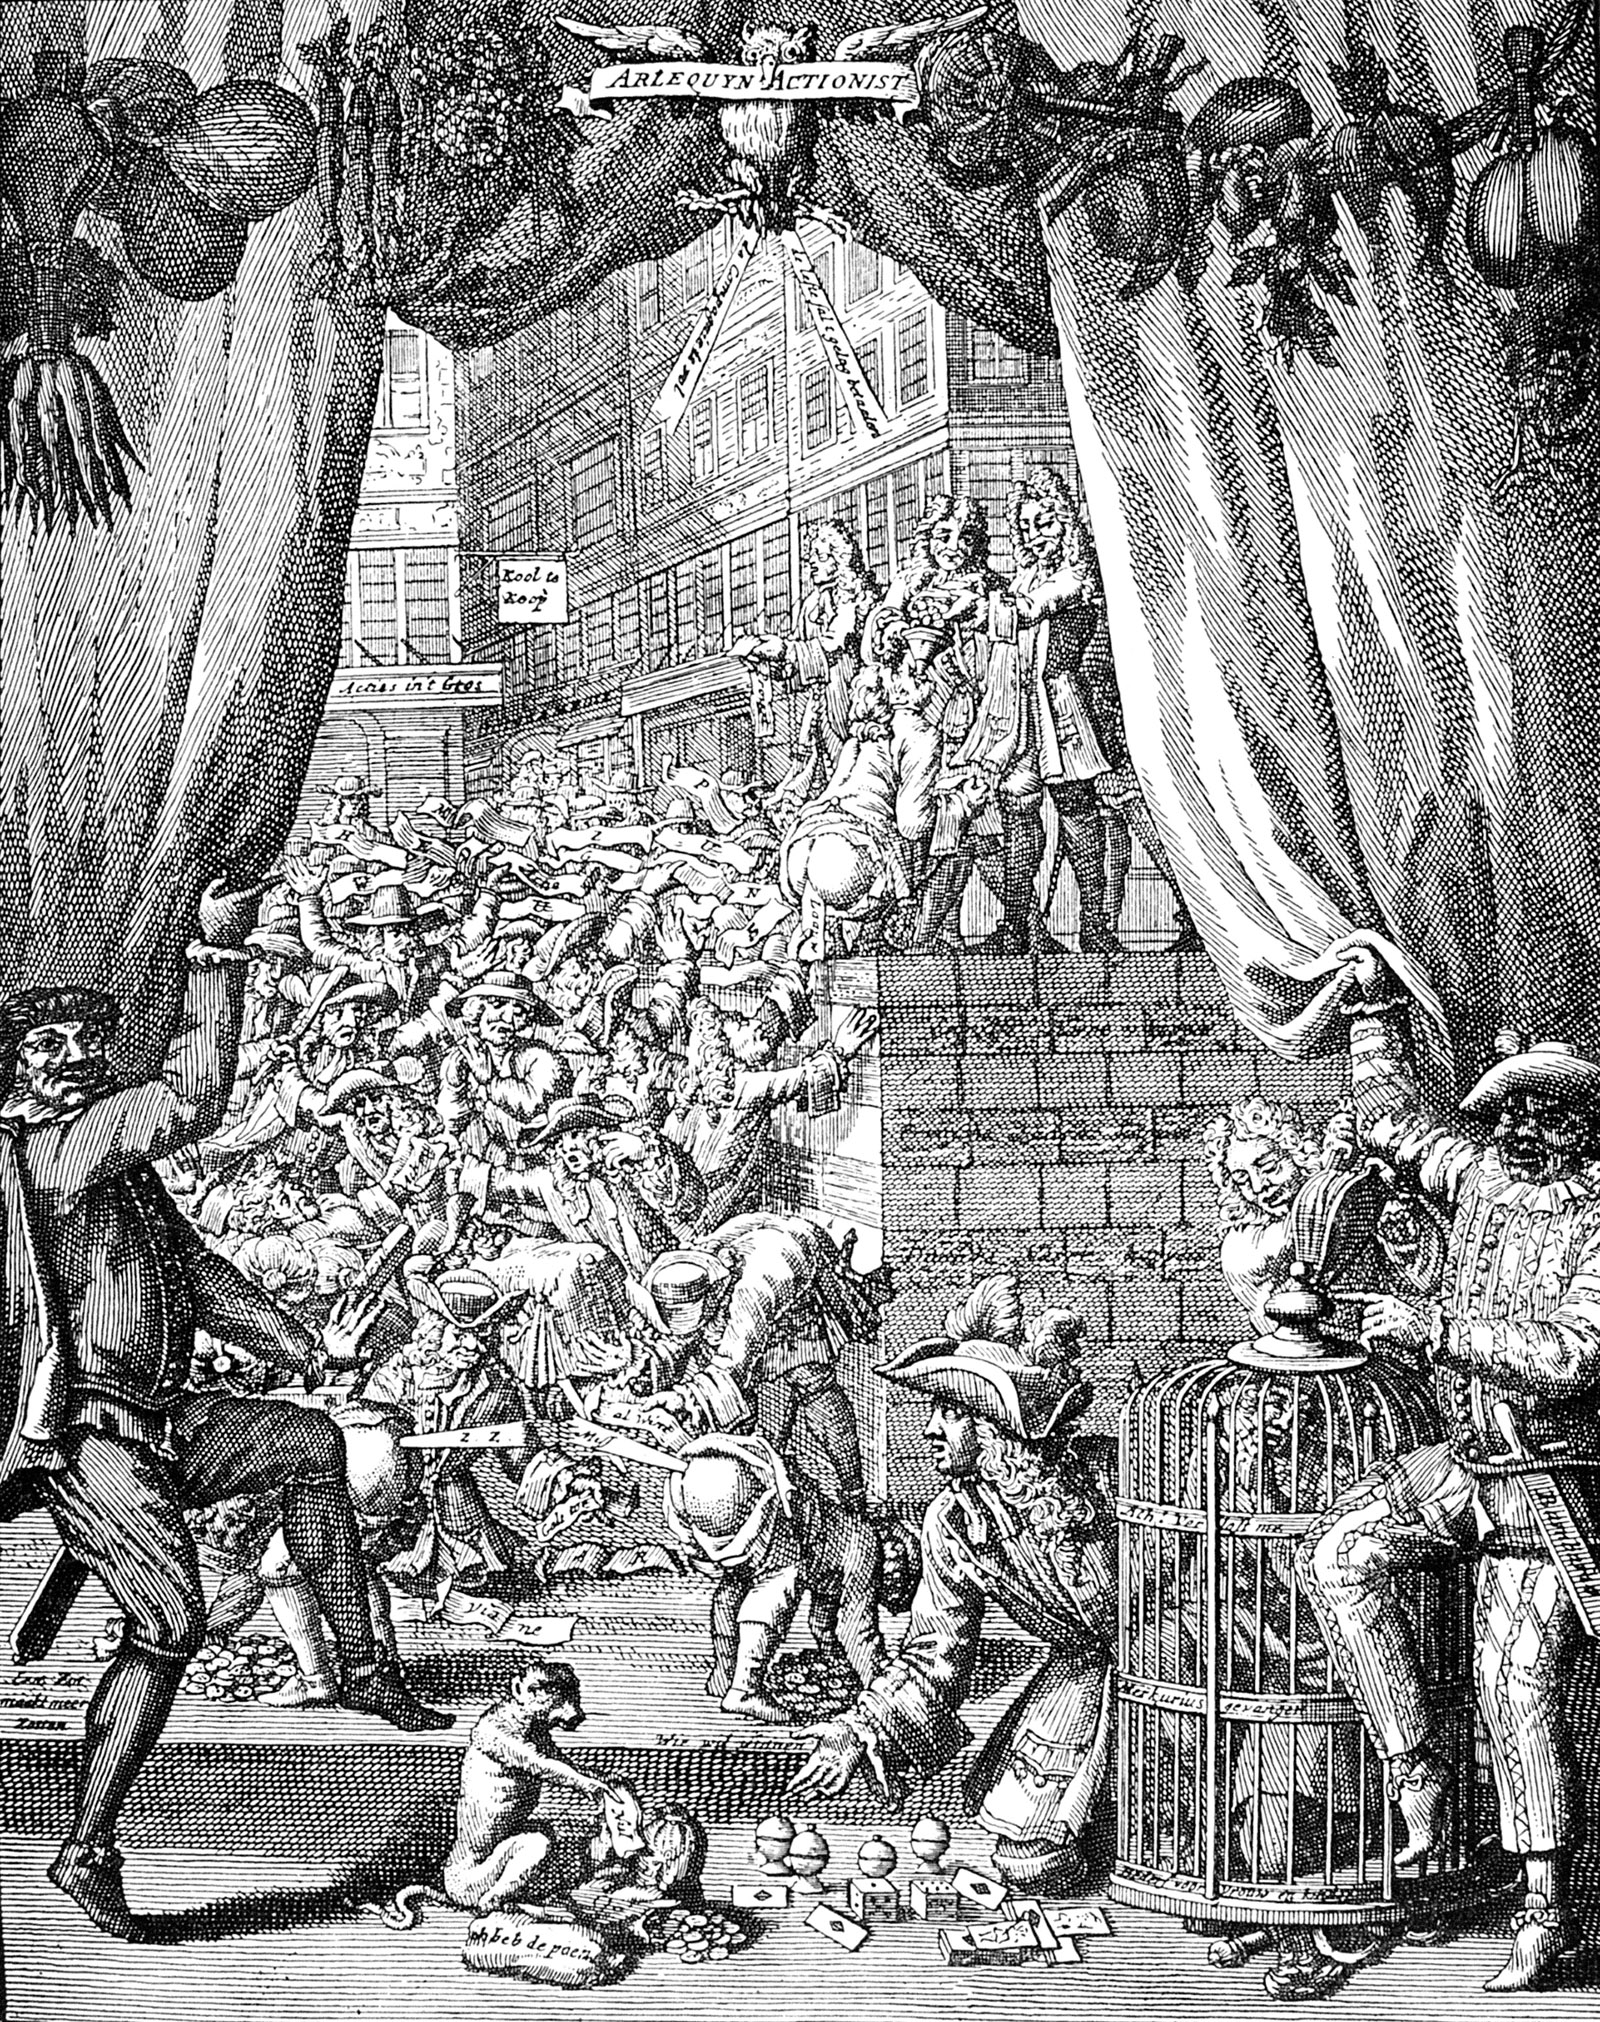 A satirical engraving showing panic in Paris following the failure of John Law's financial scheme, 1720